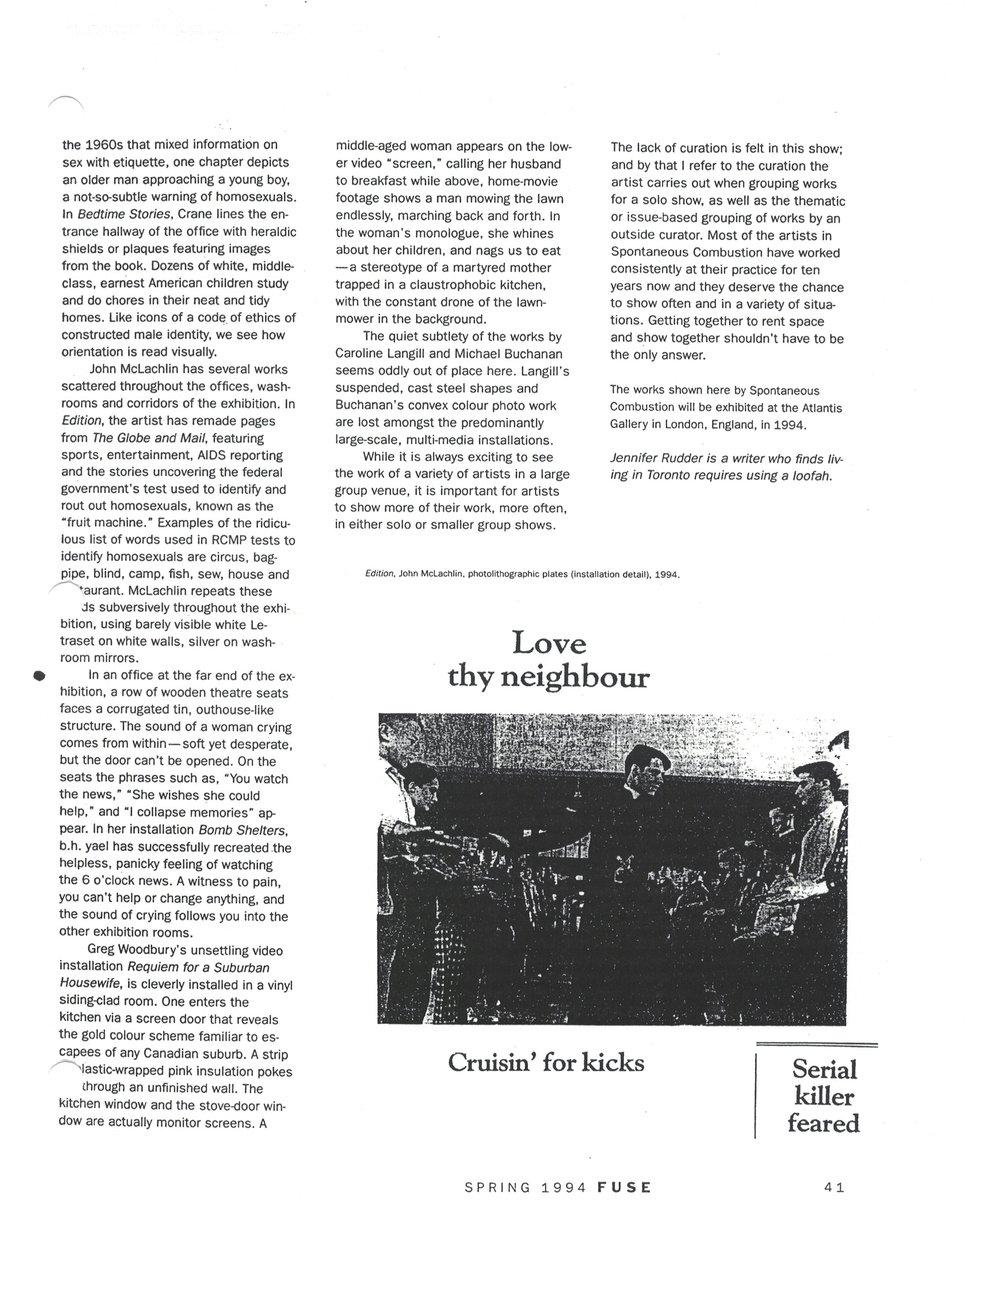 Fuse 1994 - Jennifer Rudder3.jpg